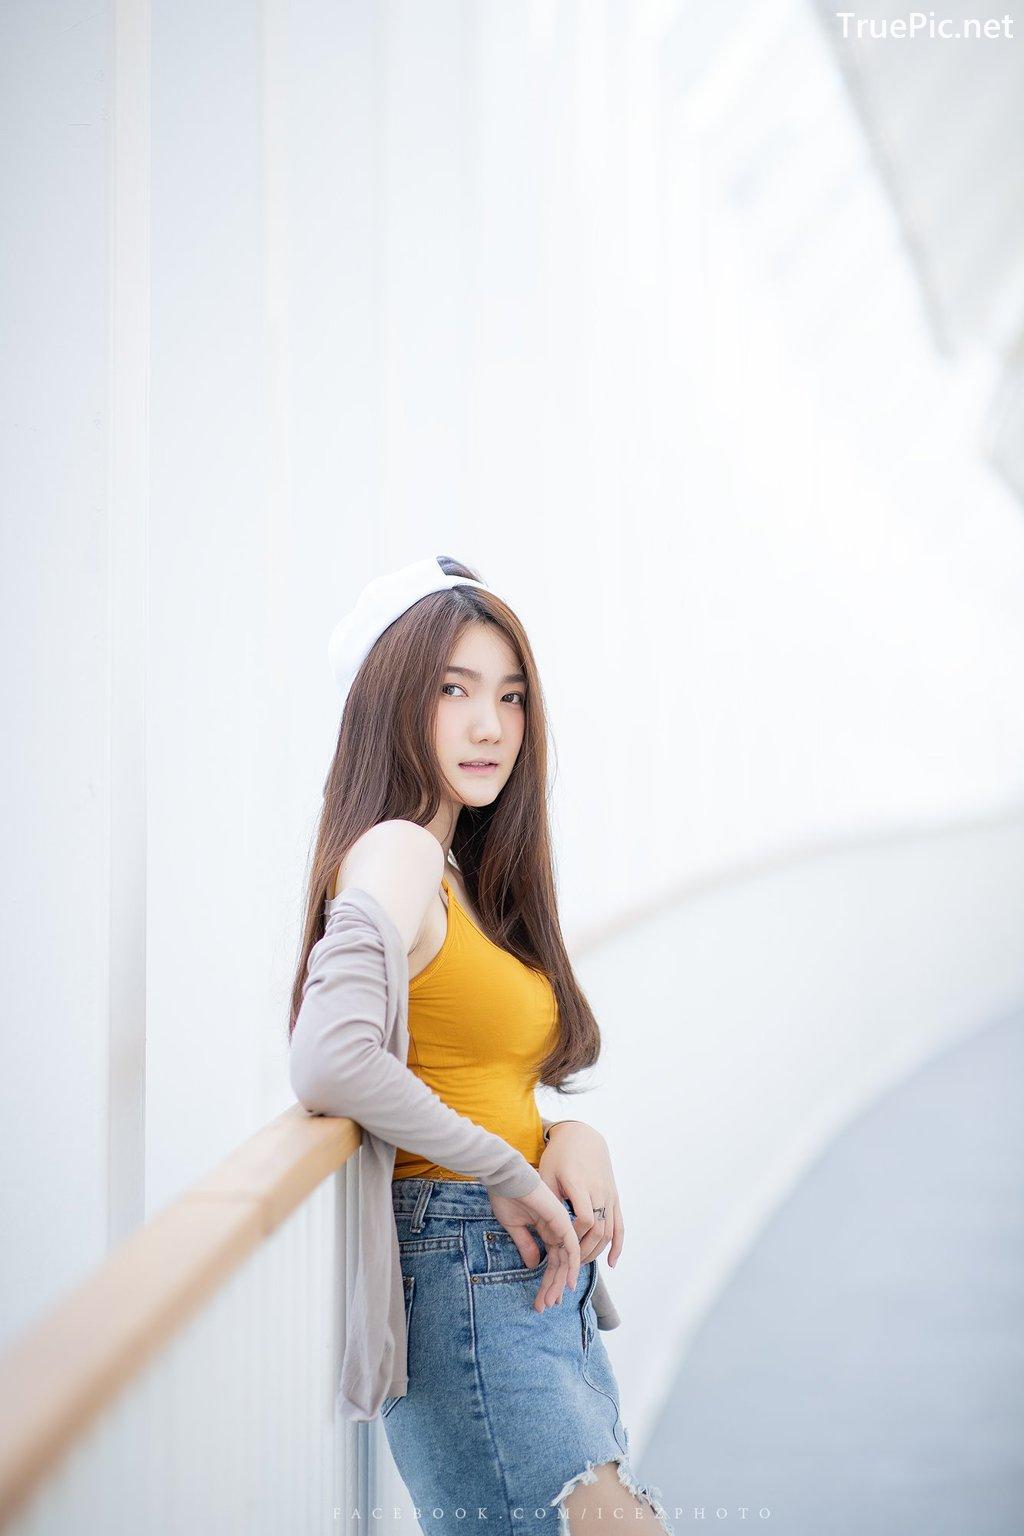 Image-Thailand-Cute-Model-Creammy-Chanama-Beautiful-Angel-In-Flower-Garden-TruePic.net- Picture-1